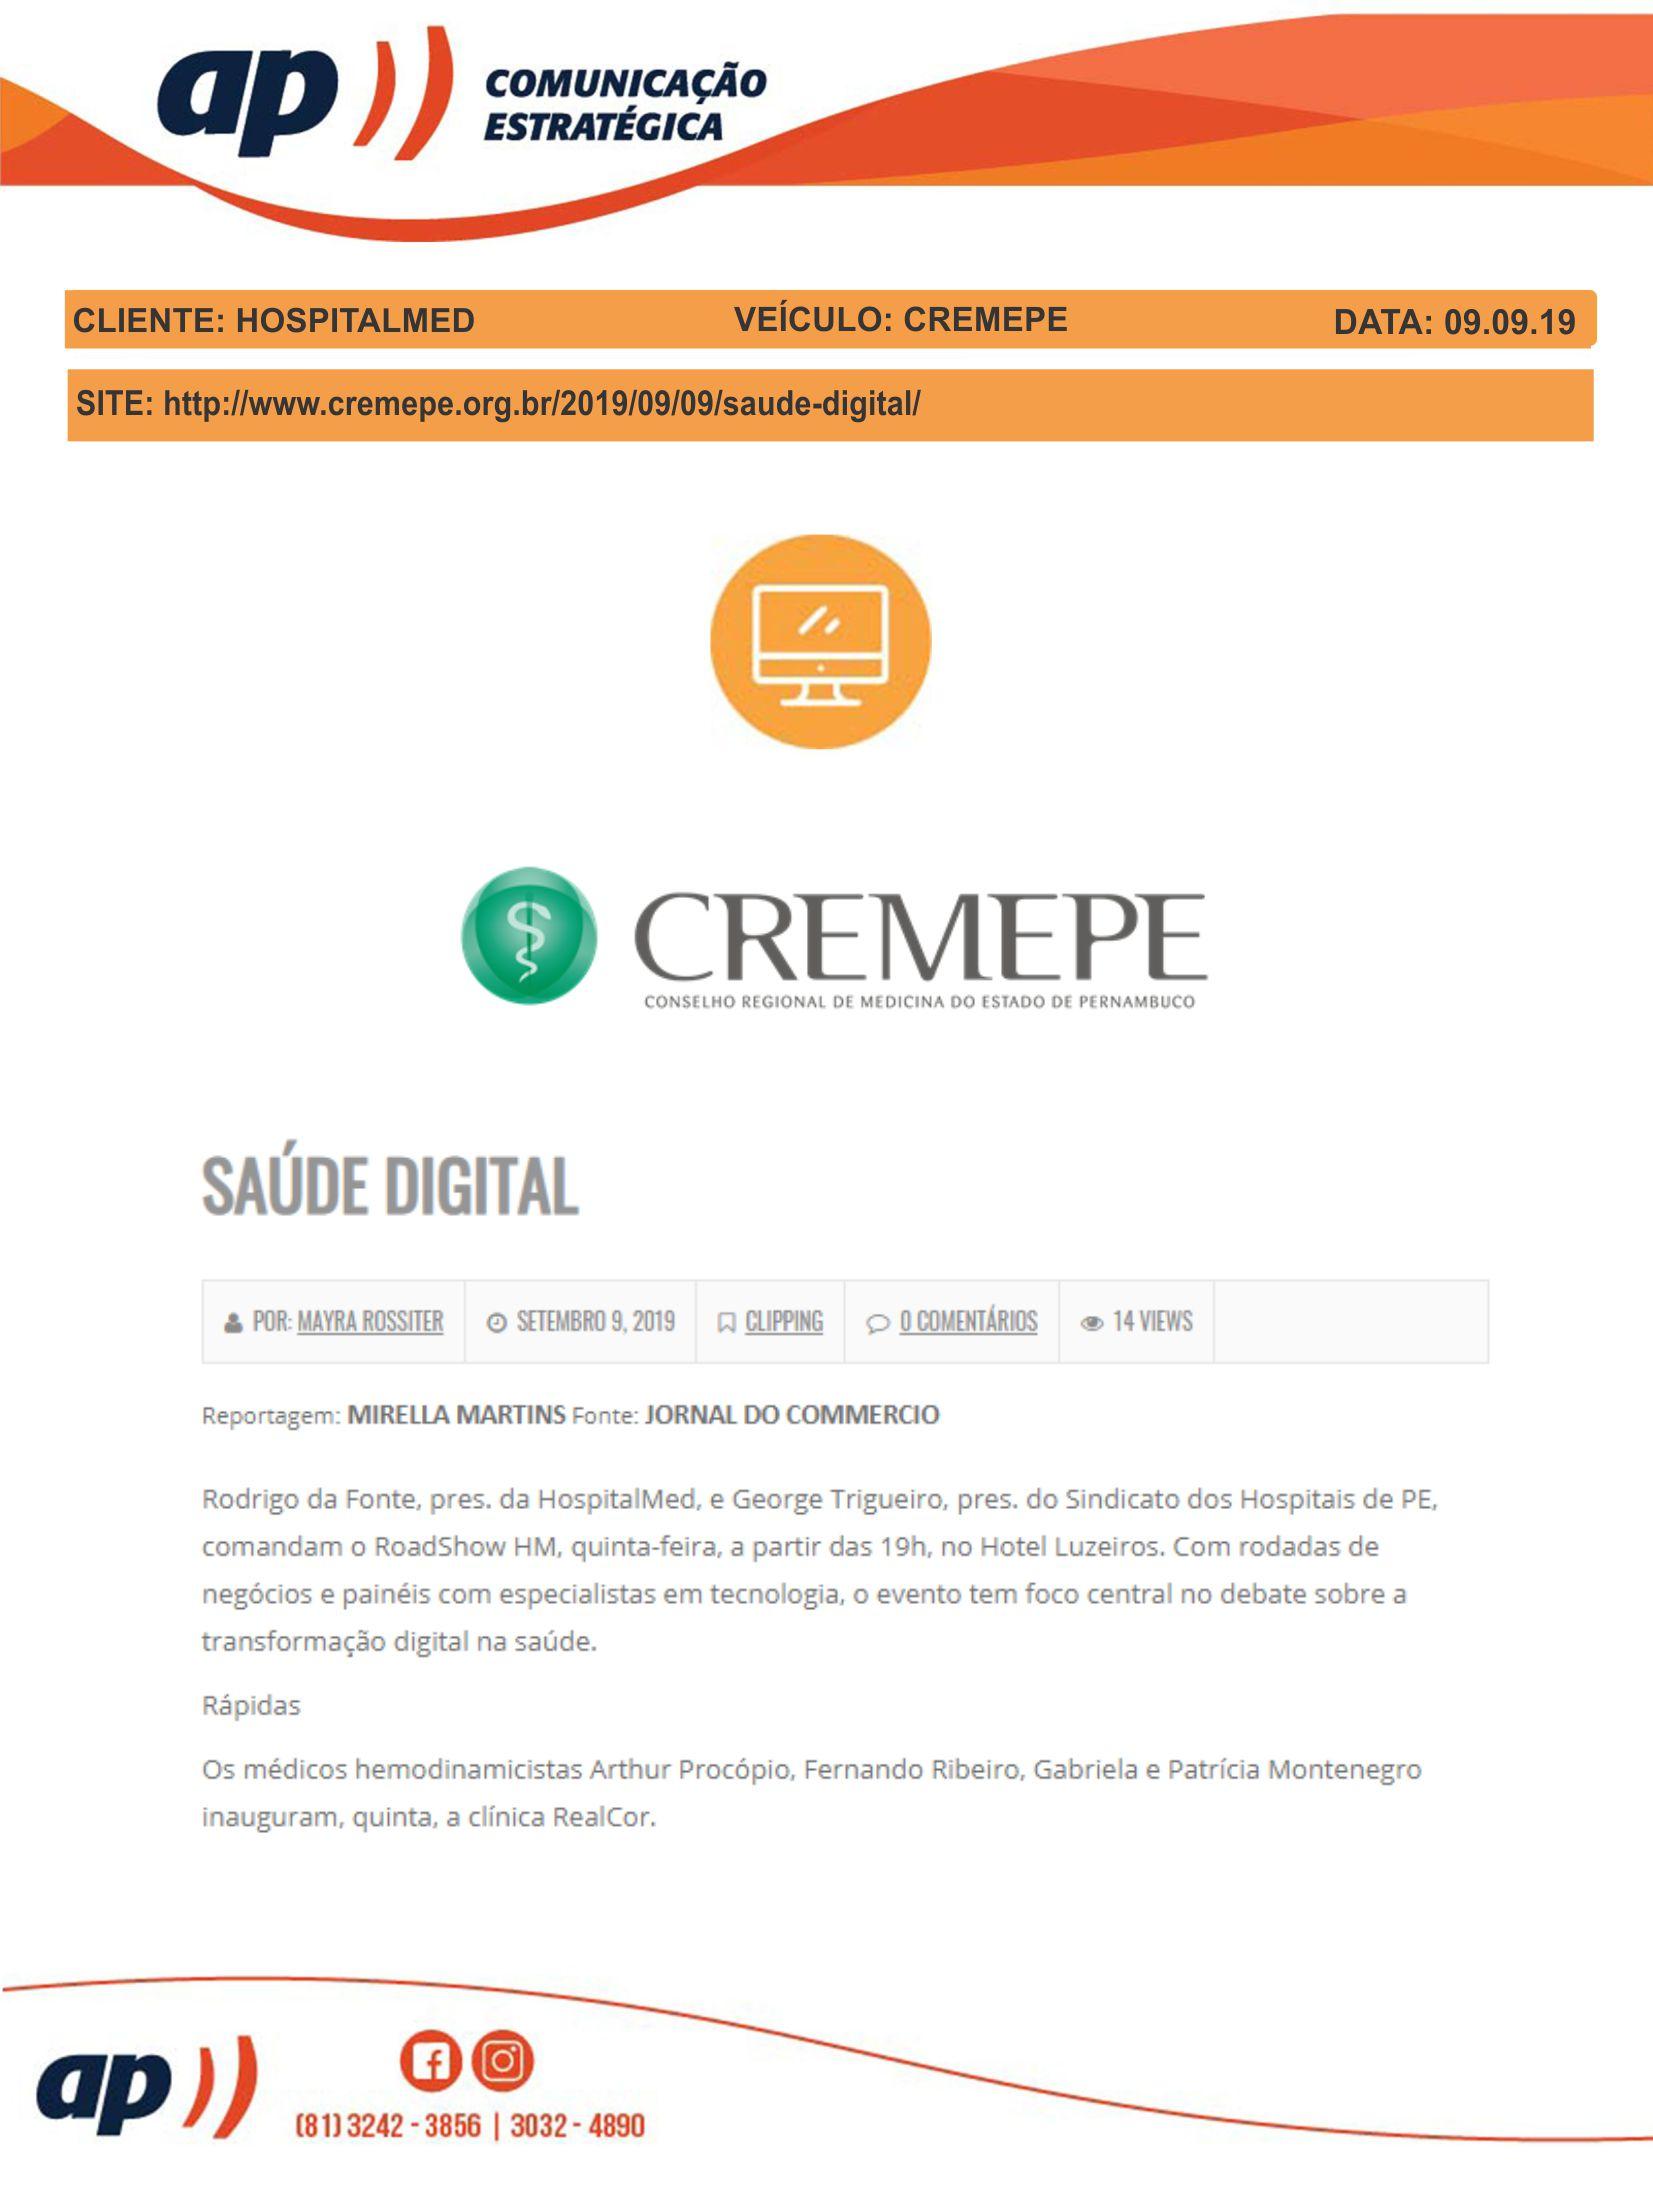 09.09.19 - CREMEPE